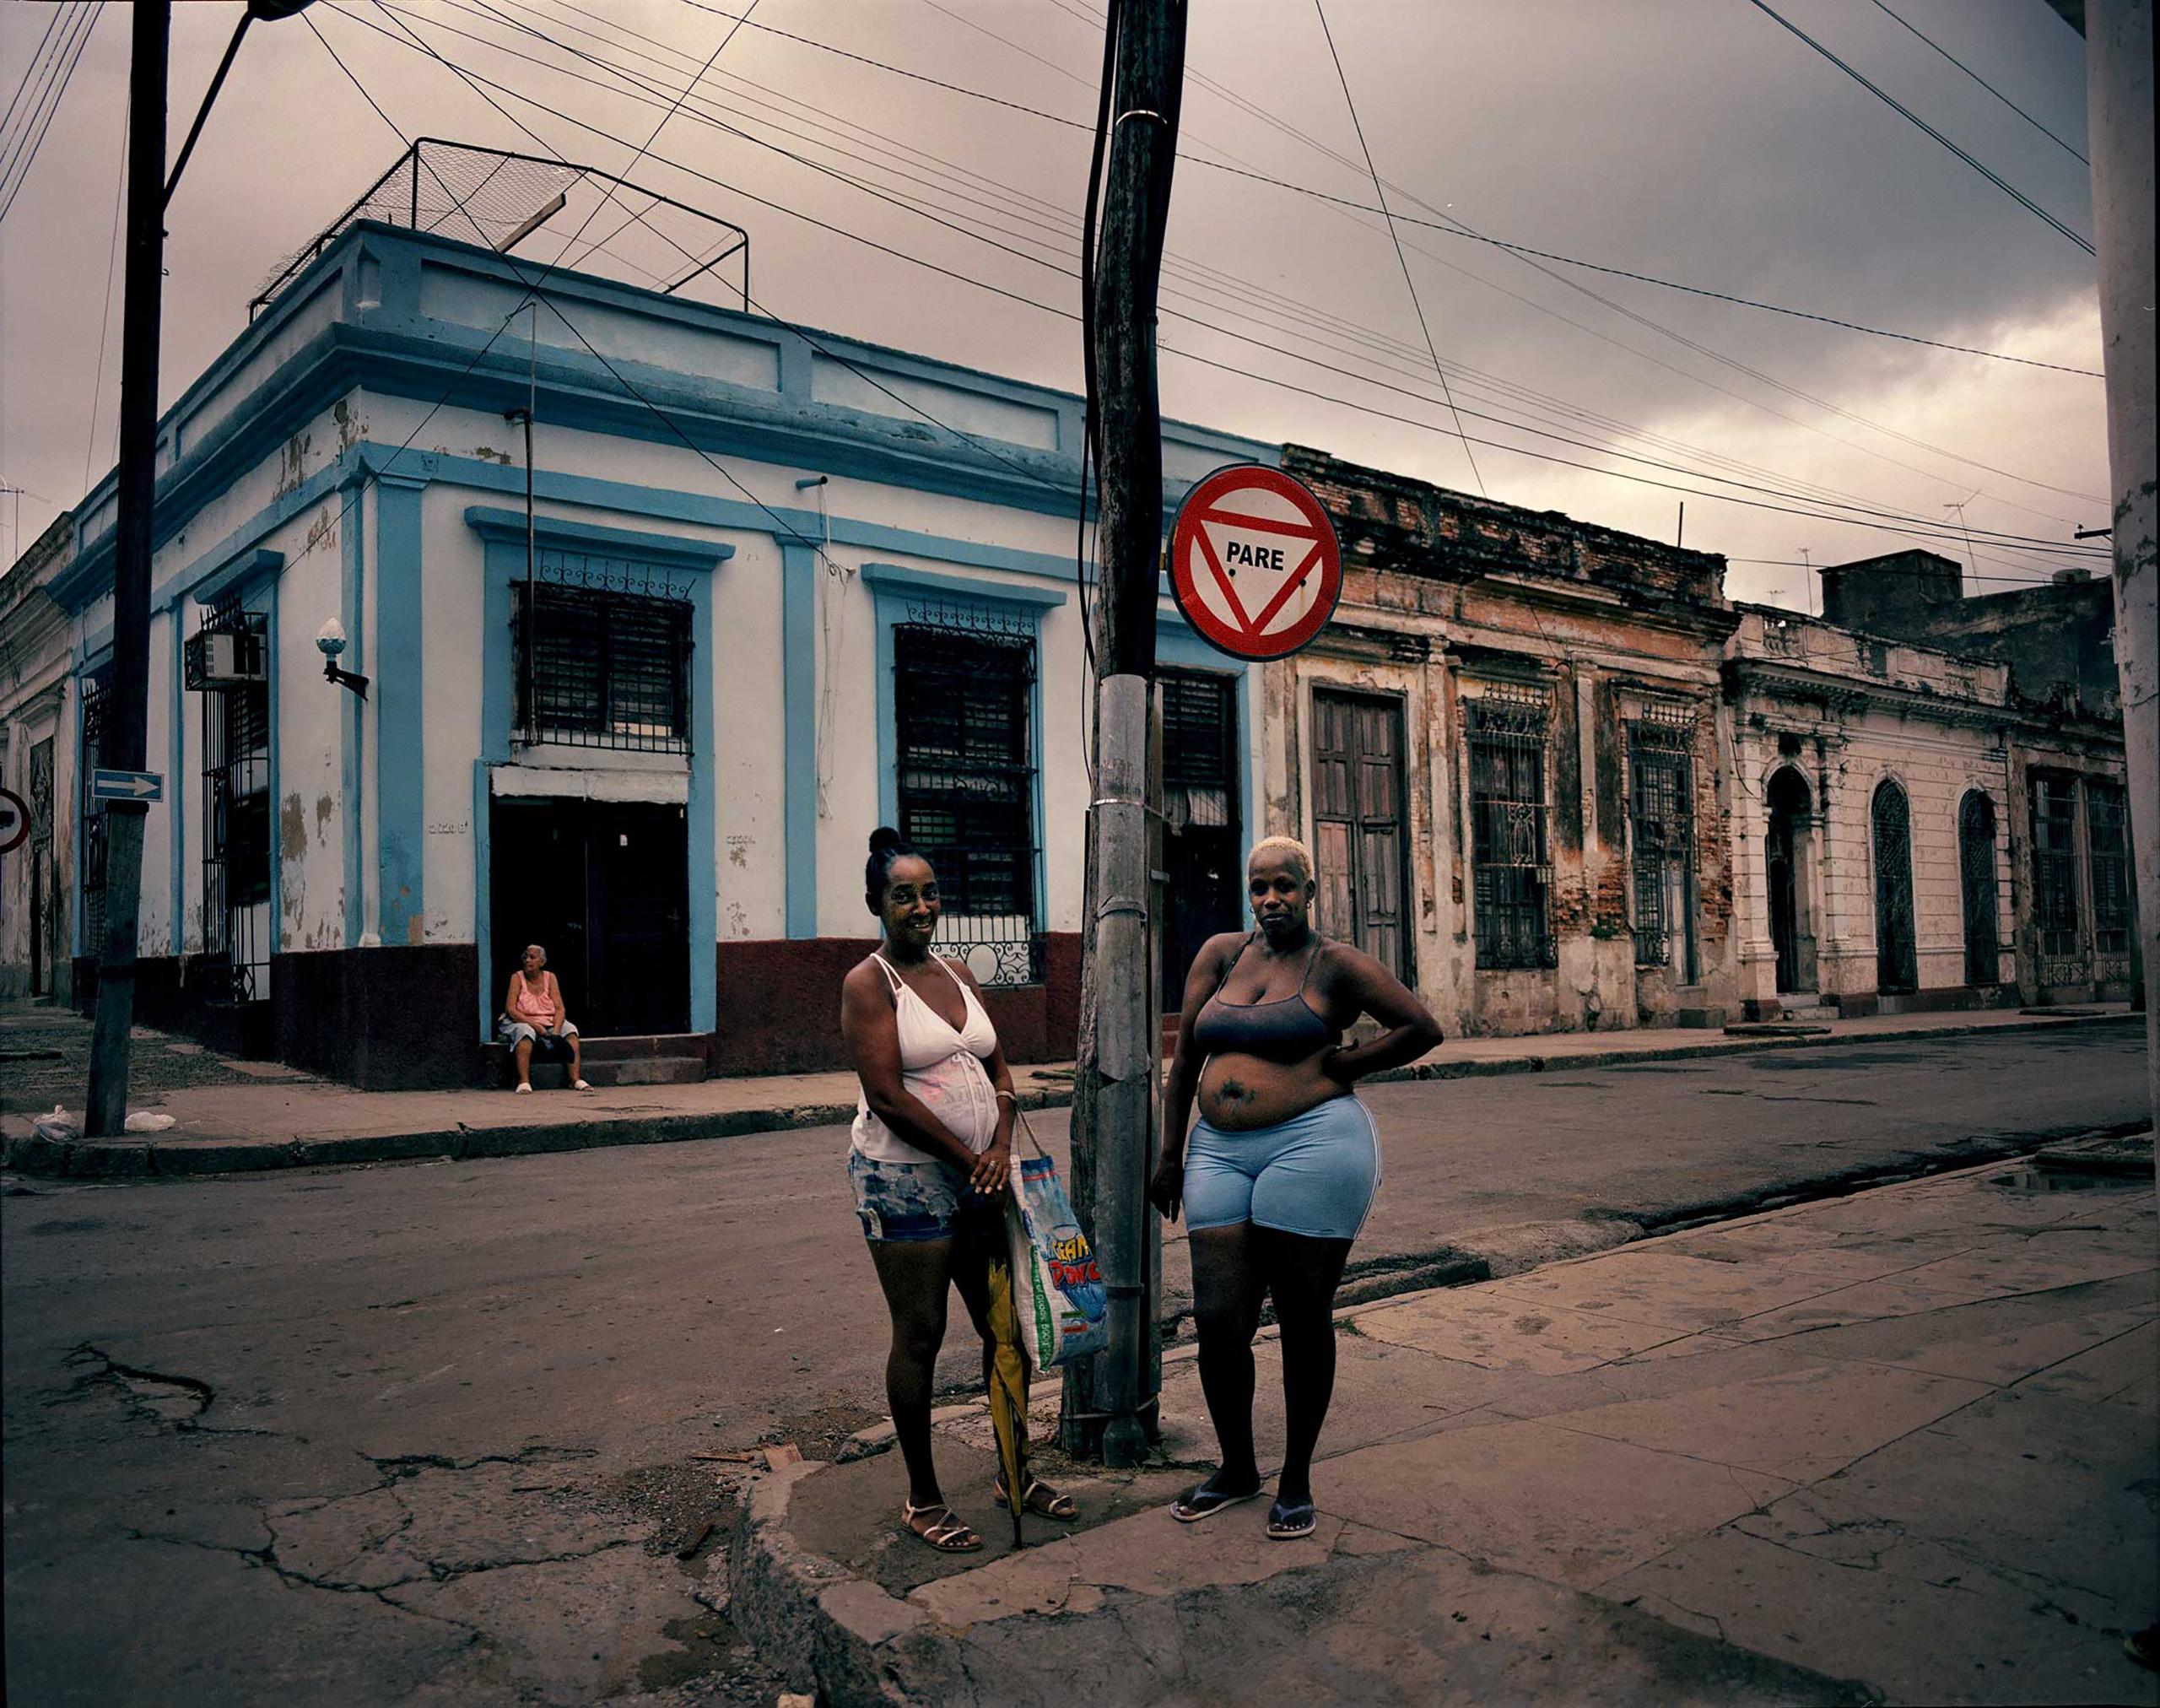 Women chatting in Cienfuegos, 270 kilometers east of Havana, Cuba.